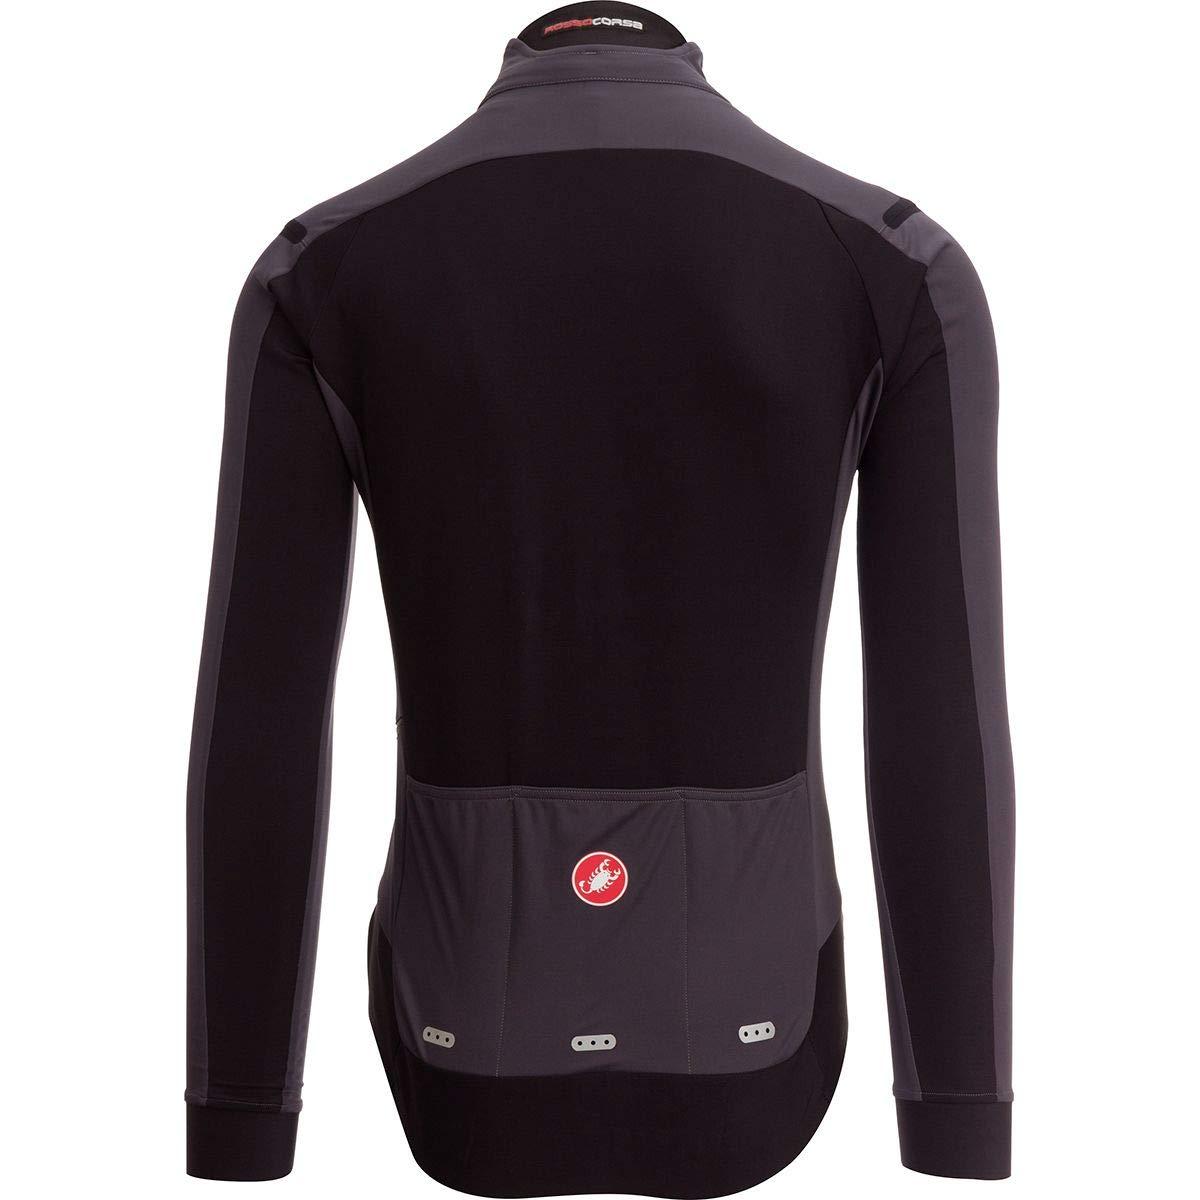 Amazon.com : Castelli Alpha ROS Light Limited Edition Jacket ...